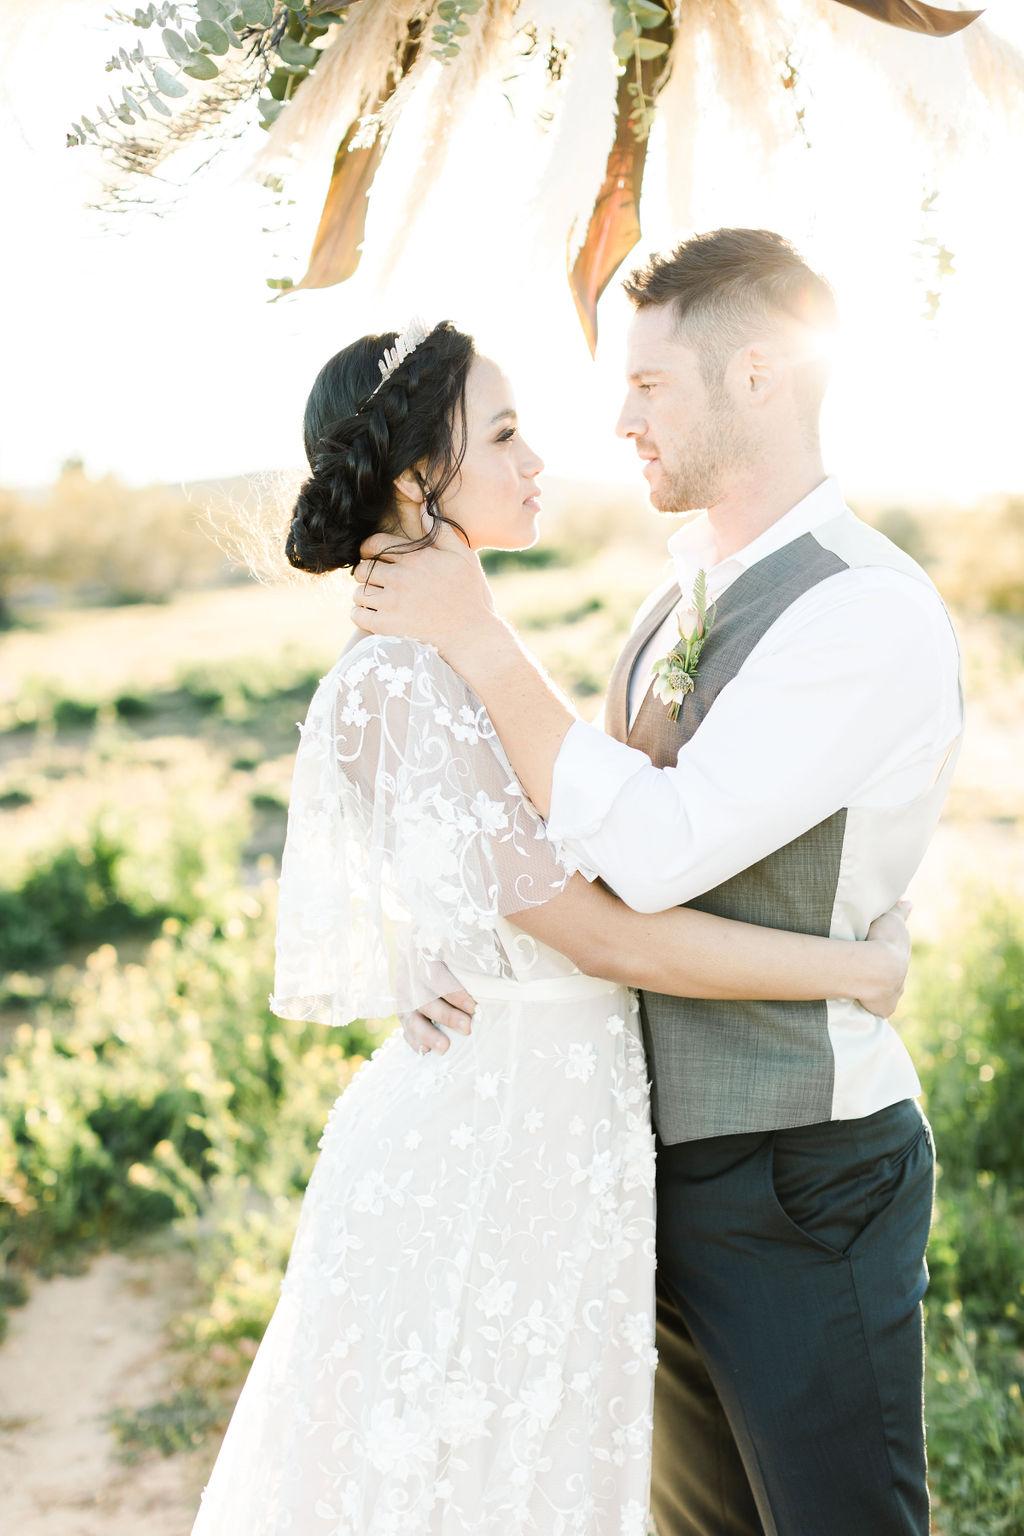 braided updo for LA wedding